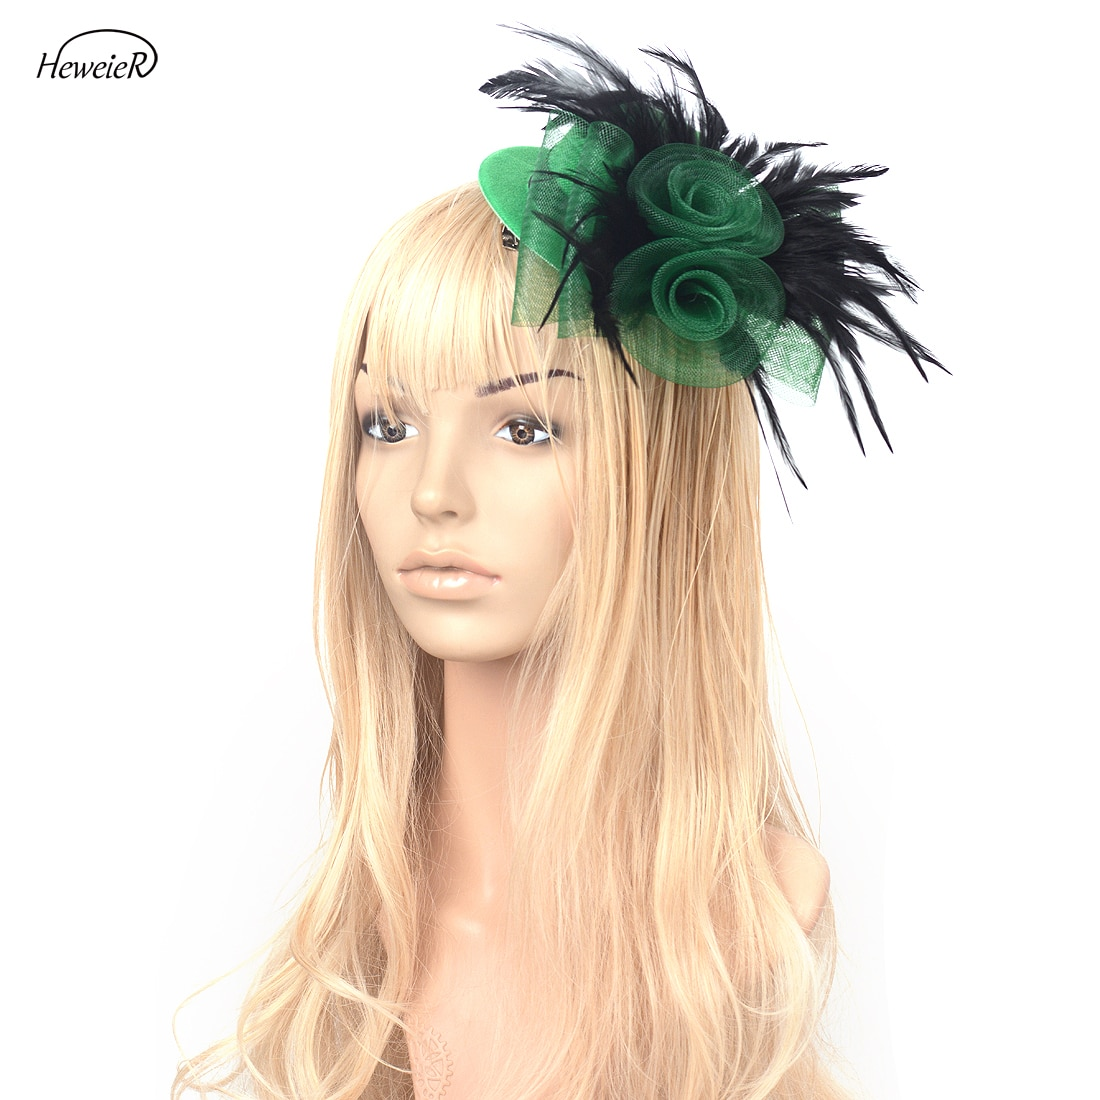 Verde/azul de moda de las mujeres Fascinator Top Hat Cap Net pluma Ascot Clip de cabello para fiesta sombrero para dama Accesorios para la cabeza Hairpiece